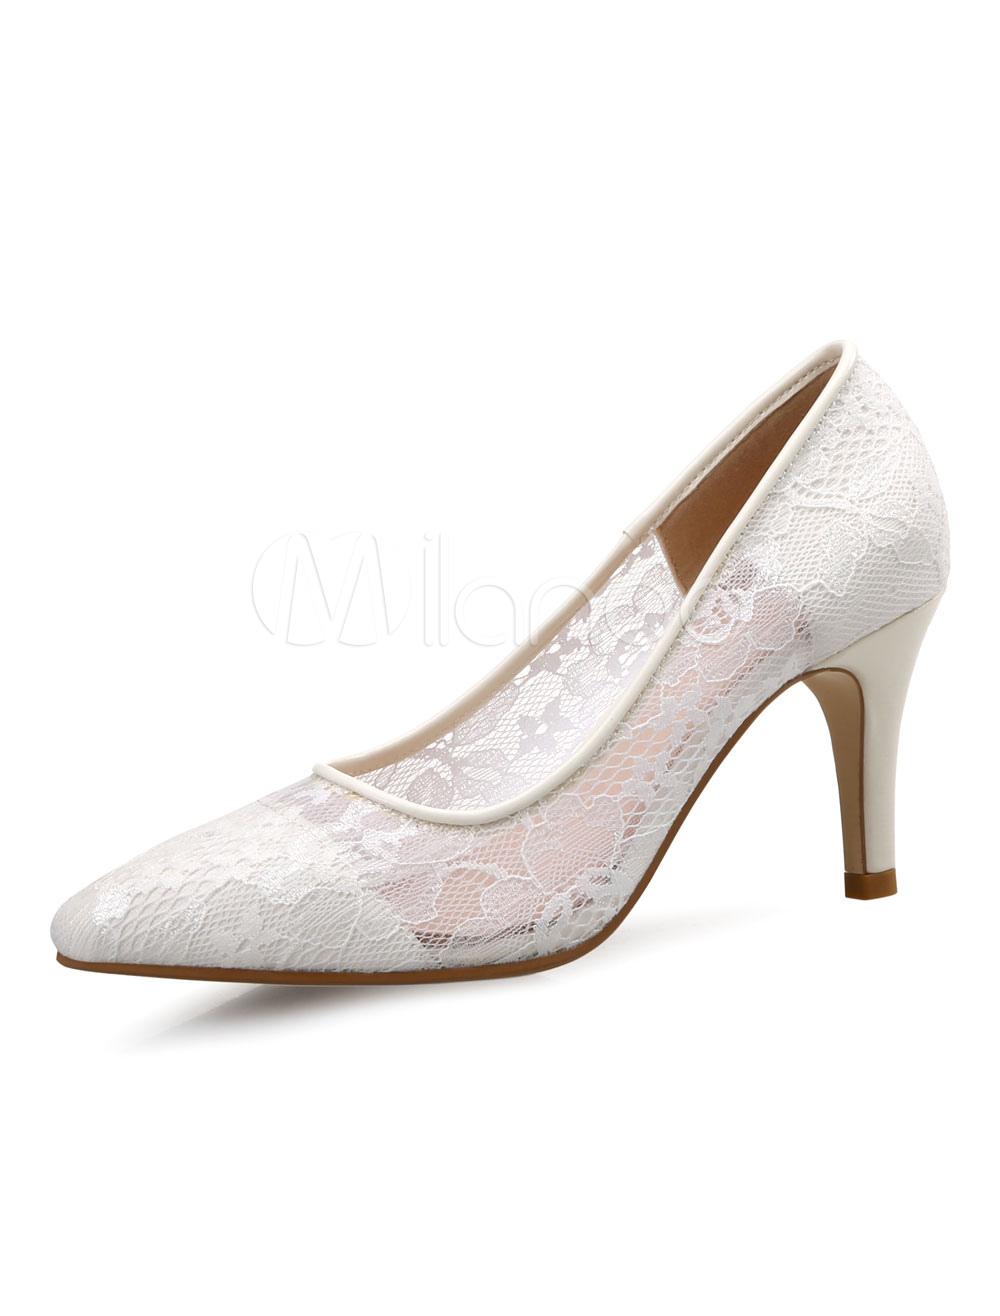 White Women Heels Pointed Toe Slip On Stiletto High Heel Lace Pumps thumbnail